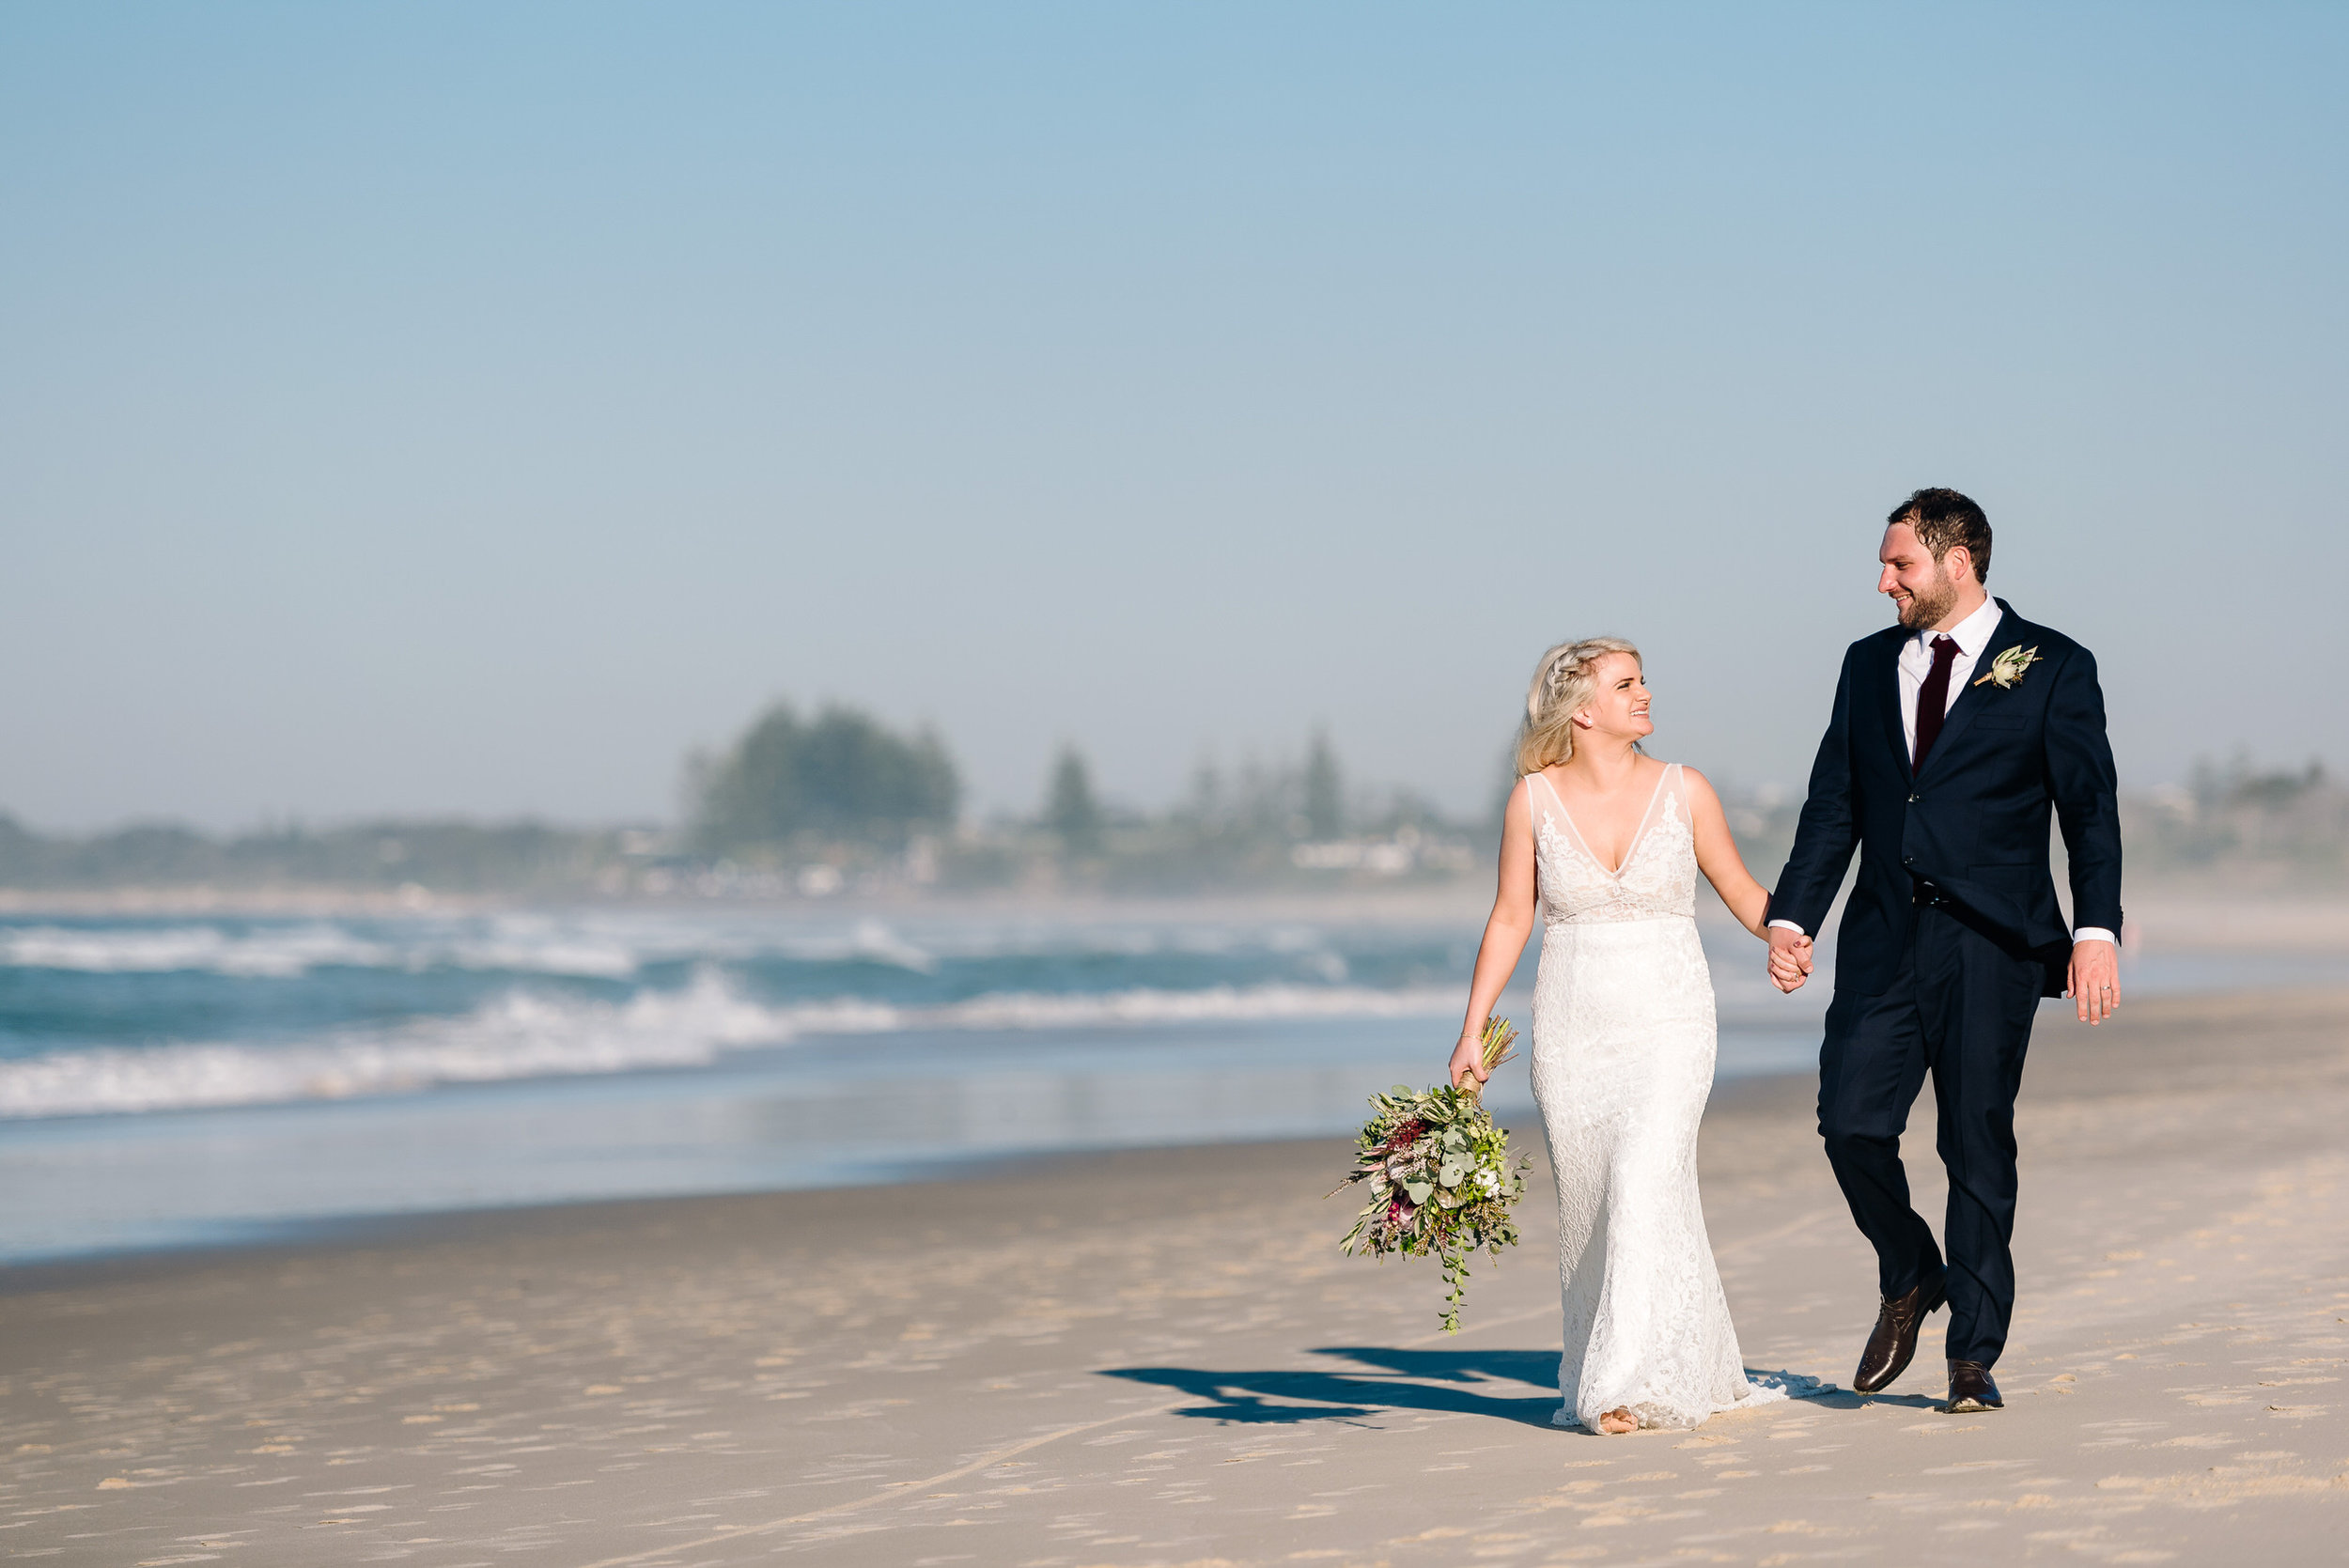 Justin_And_Jim_Photography_Byron_Bay_Wedding070.JPG